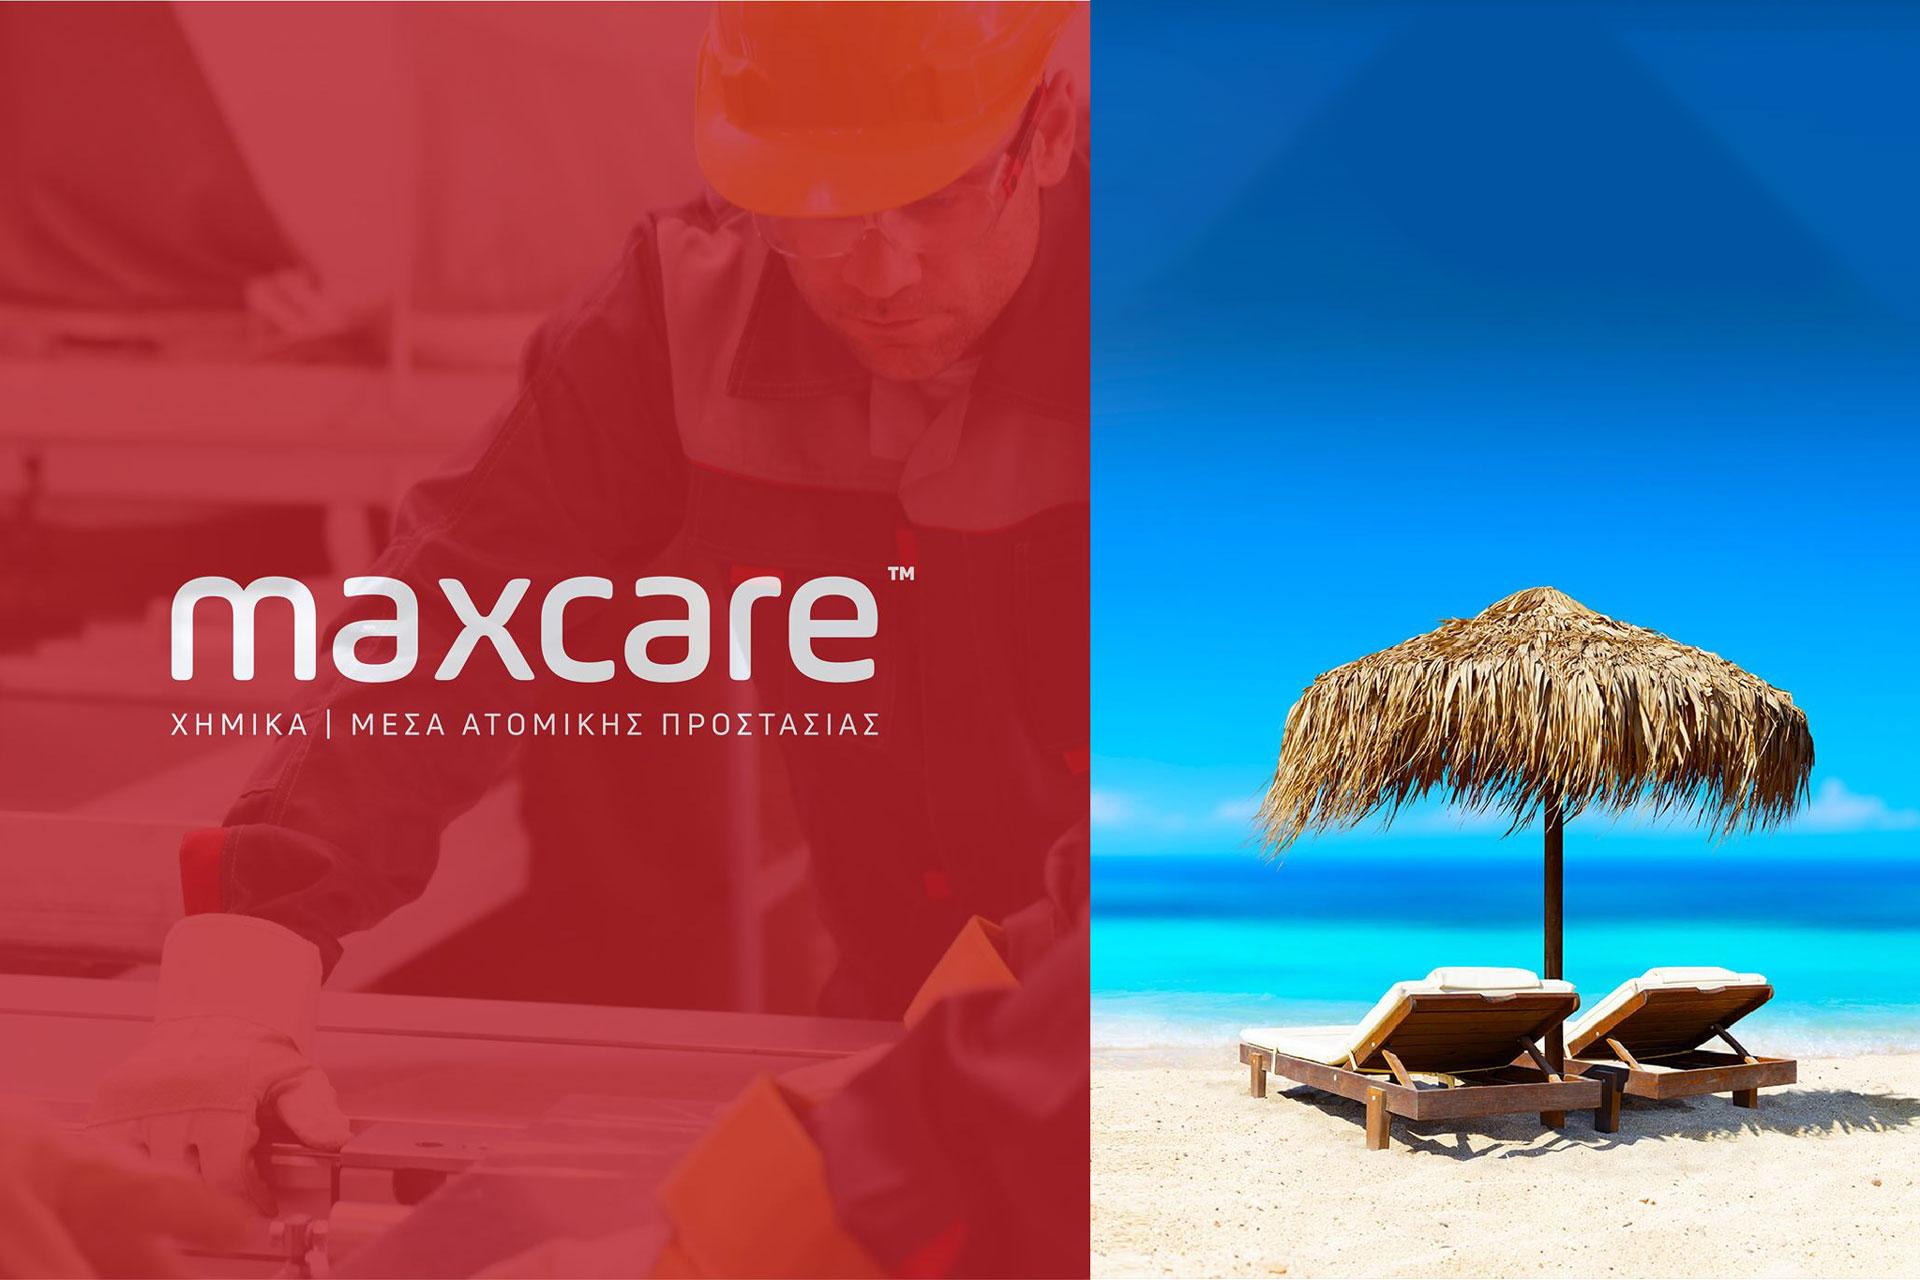 maxcare-kalokairi.jpg